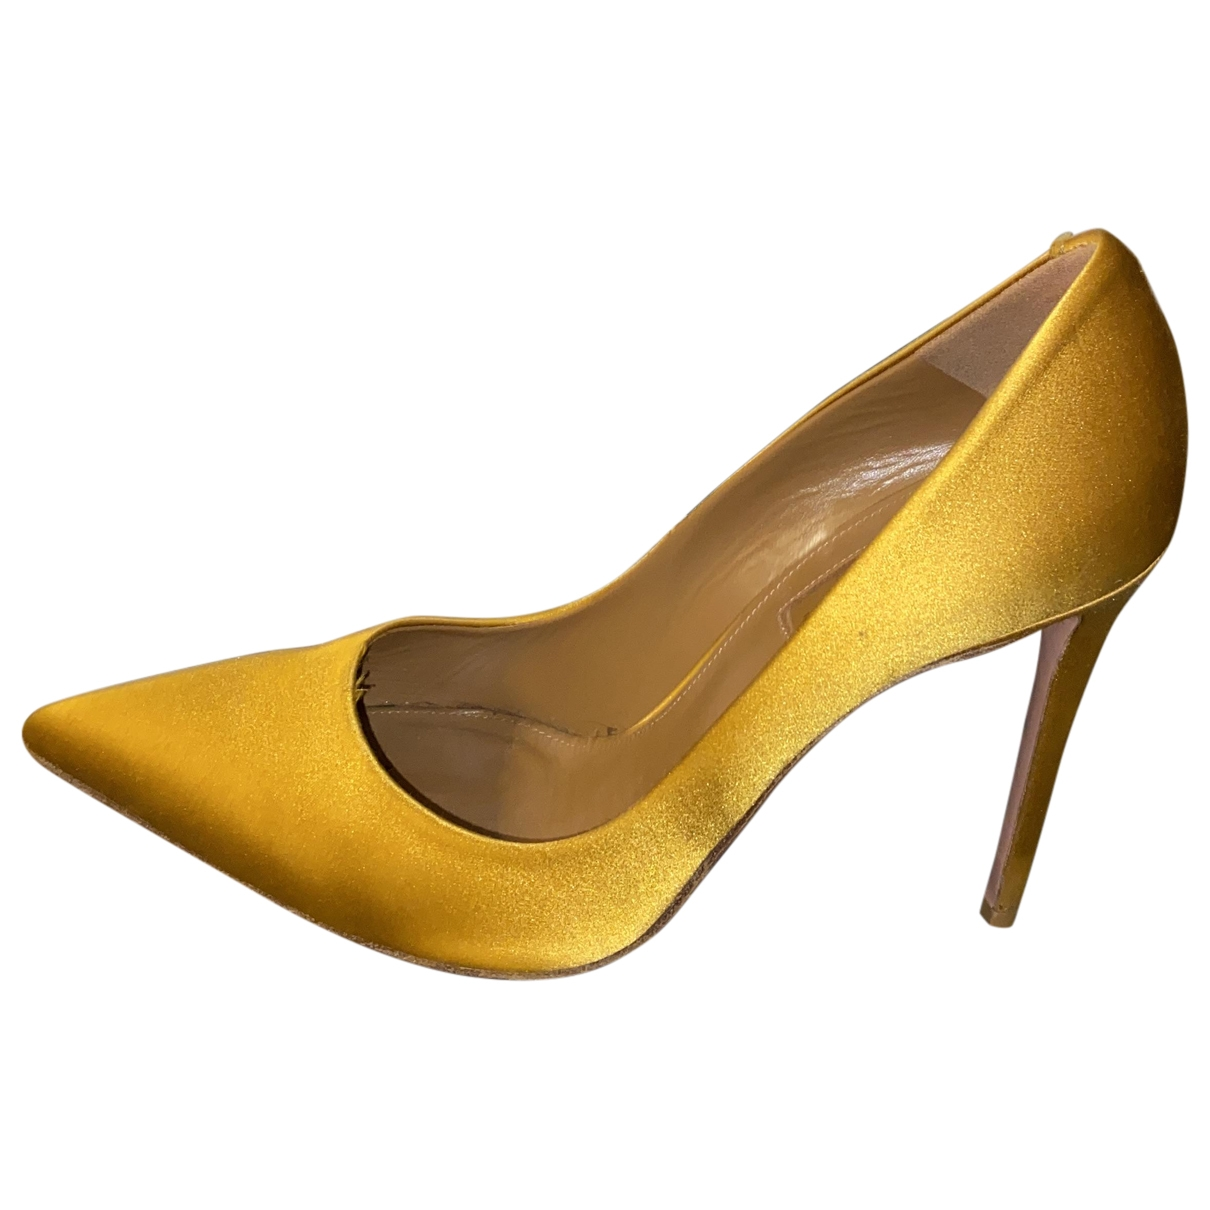 Aquazzura - Escarpins   pour femme - jaune